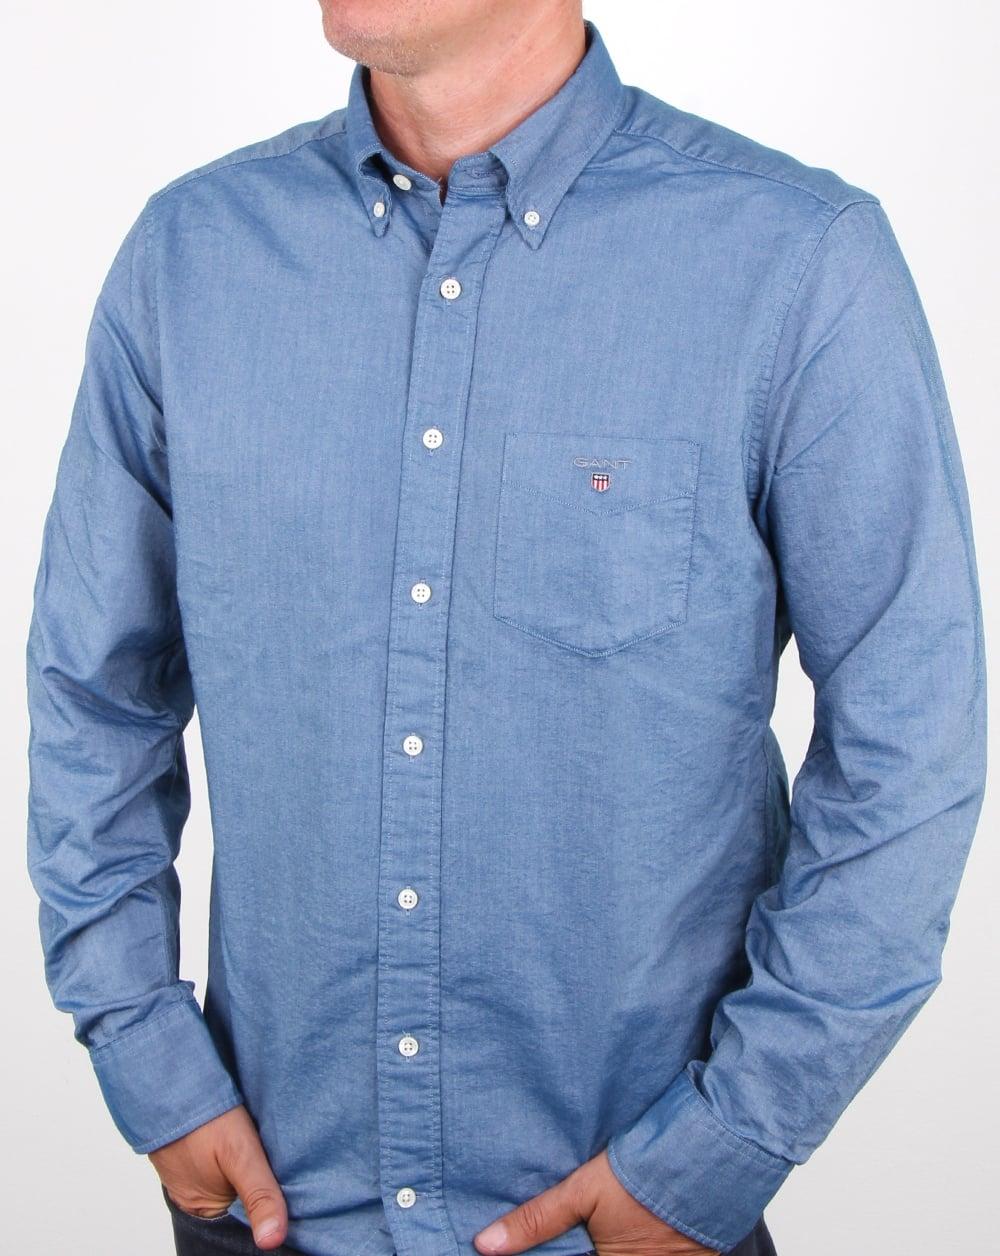 e486076fdce Gant Oxford Shirt Navy | 80s casual classics